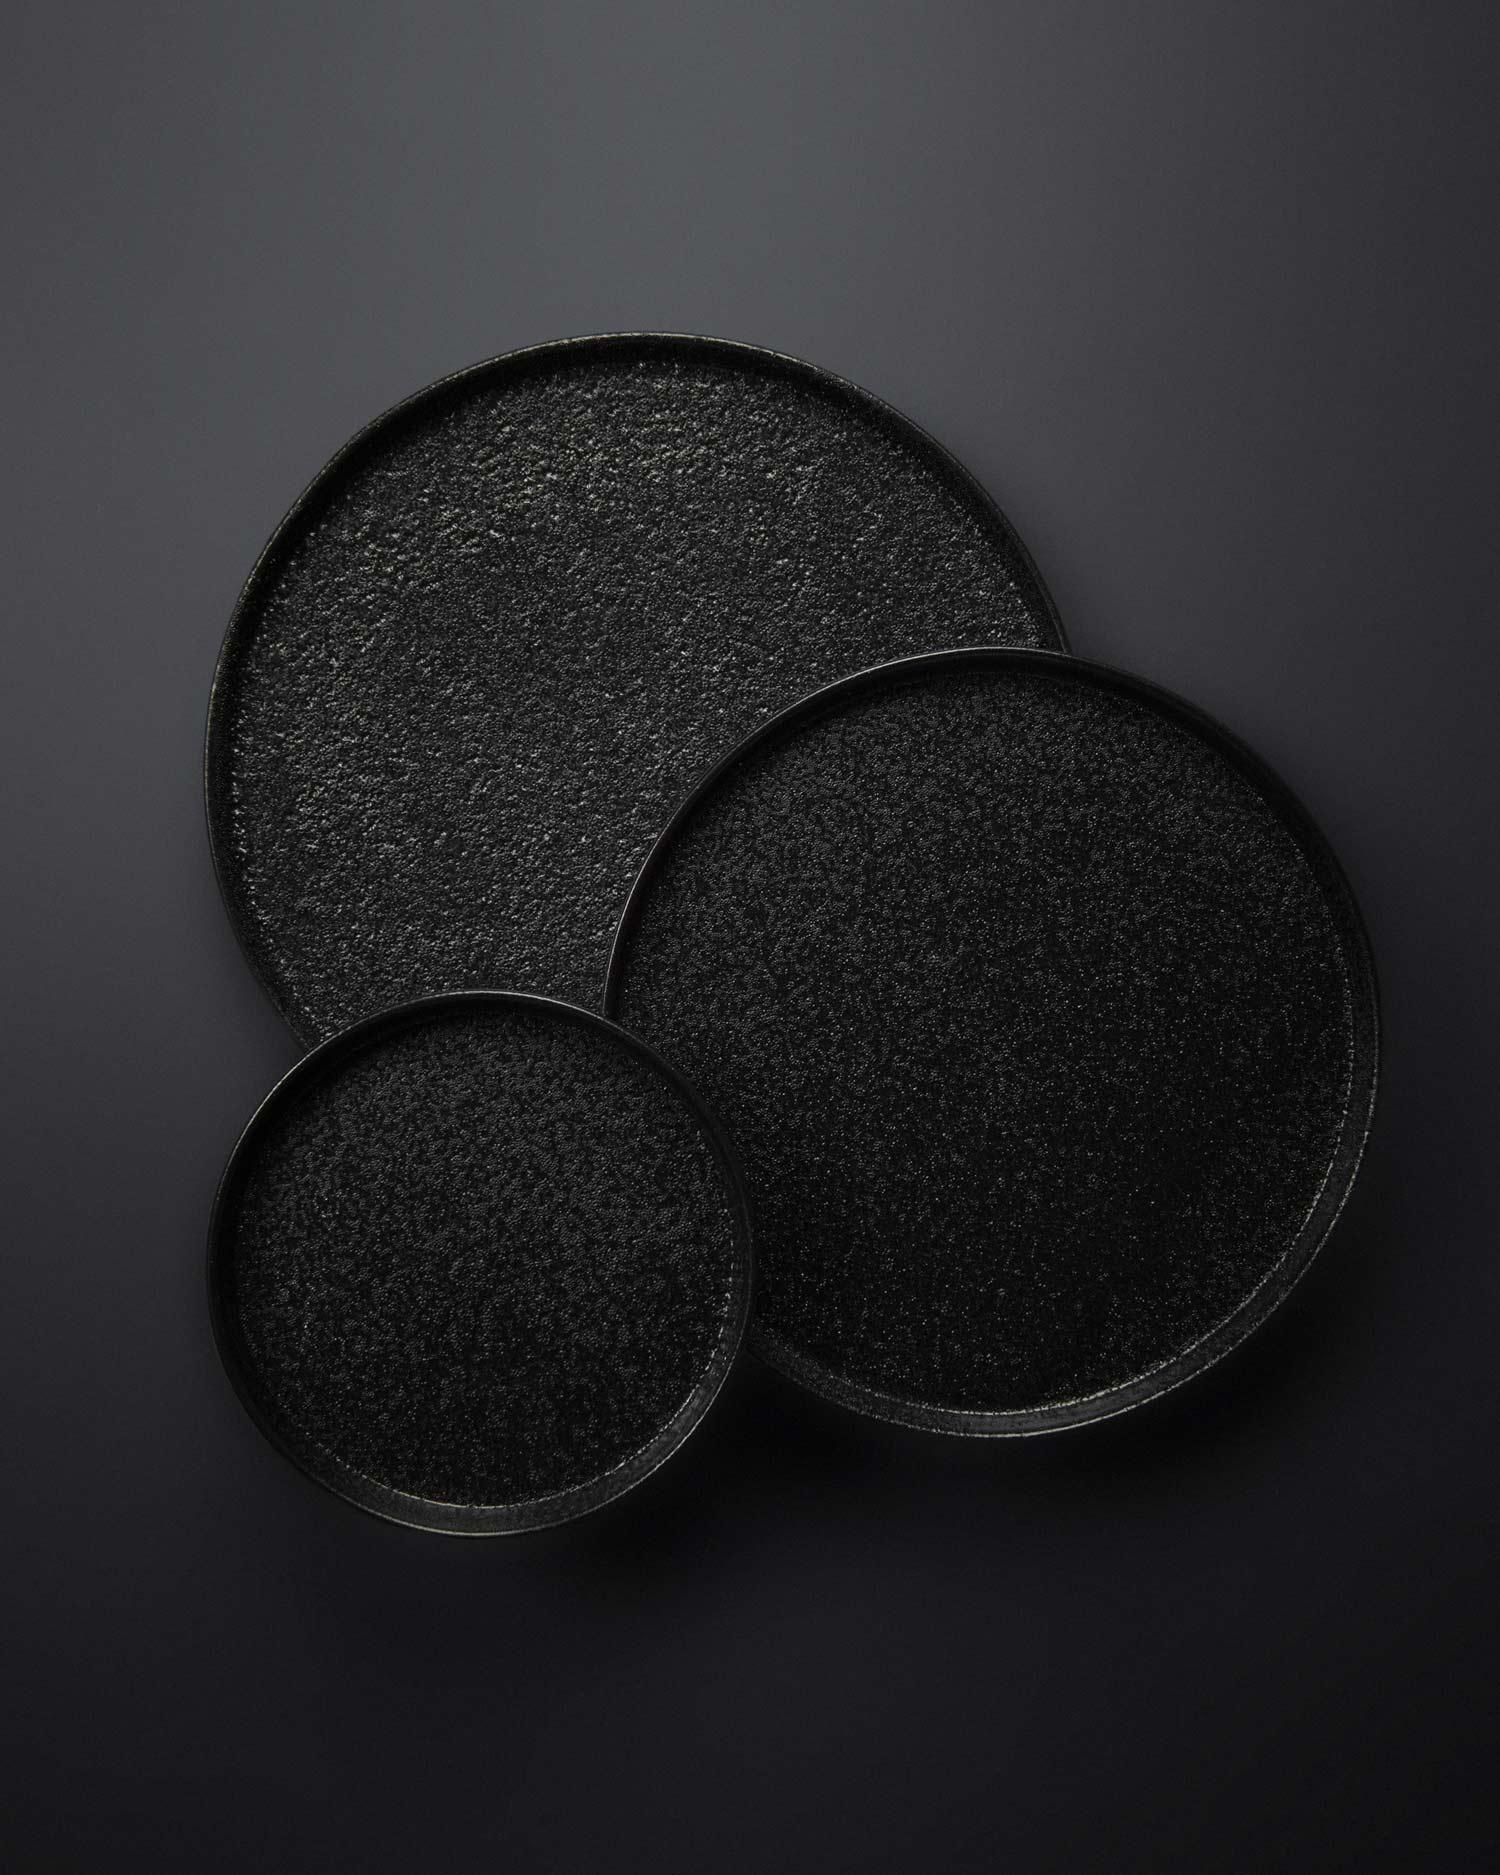 svart-yuzu-plates-1.jpg